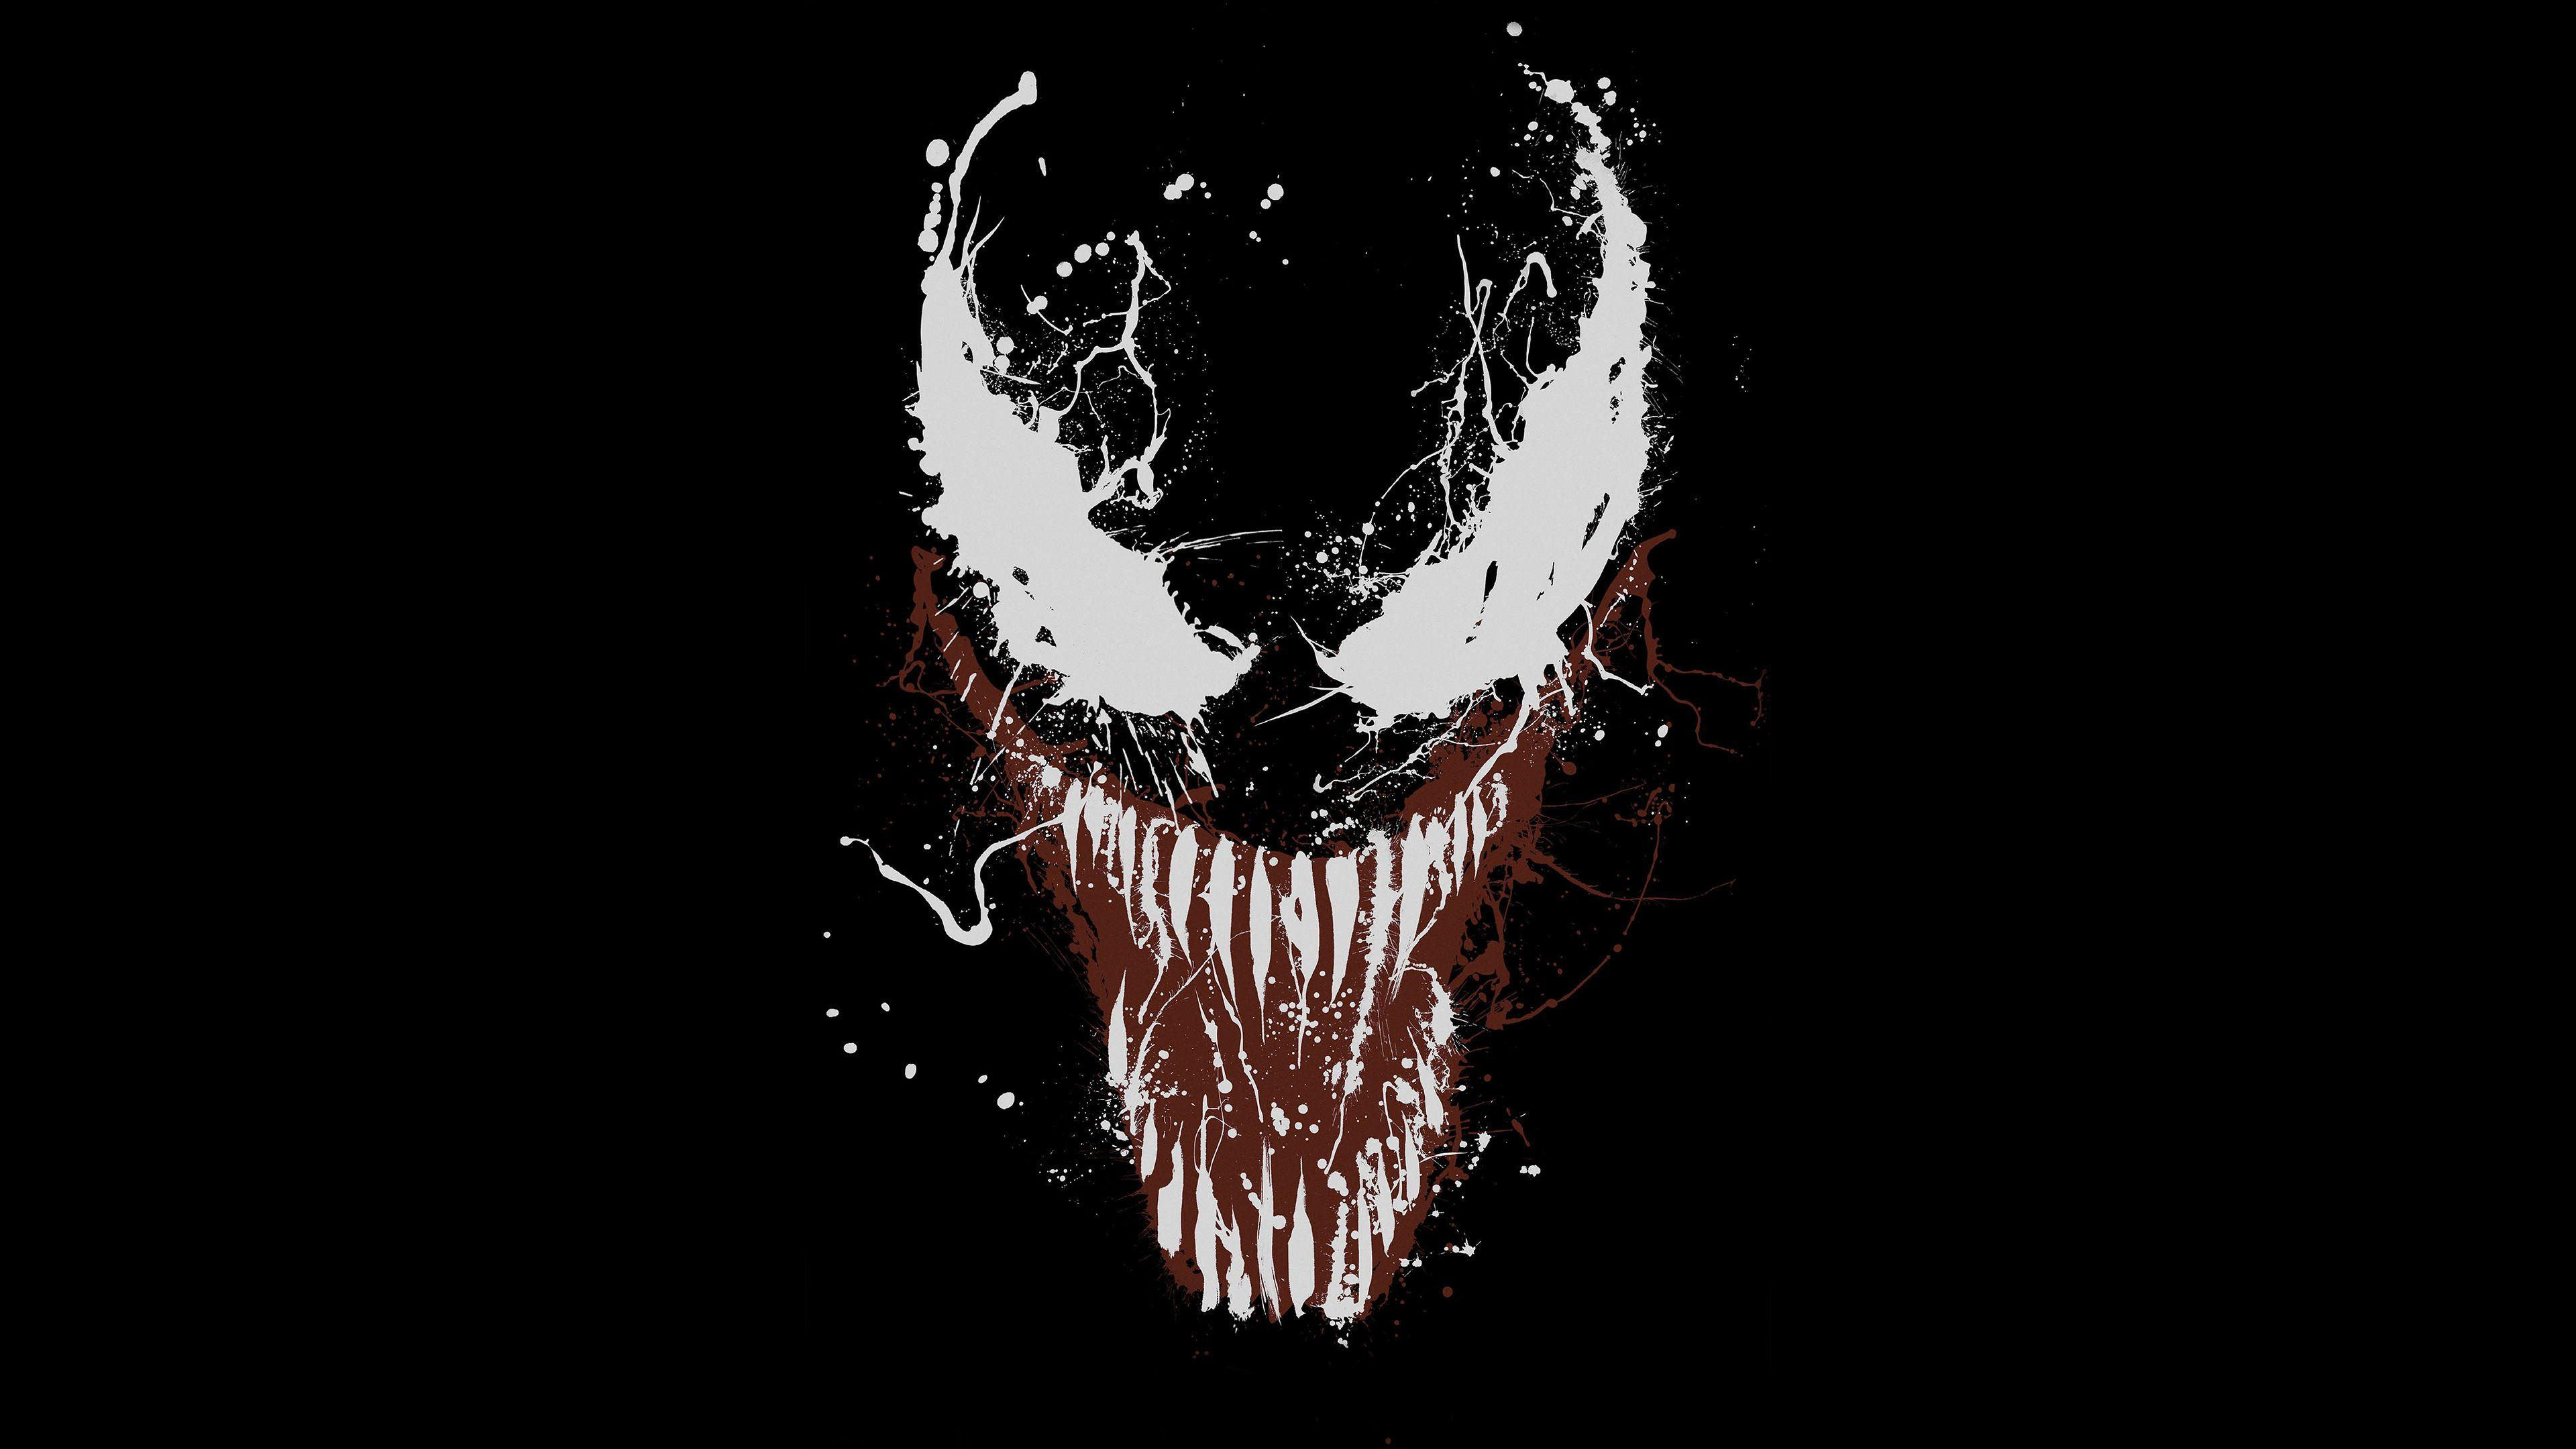 Venom Wallpaper 4k Download